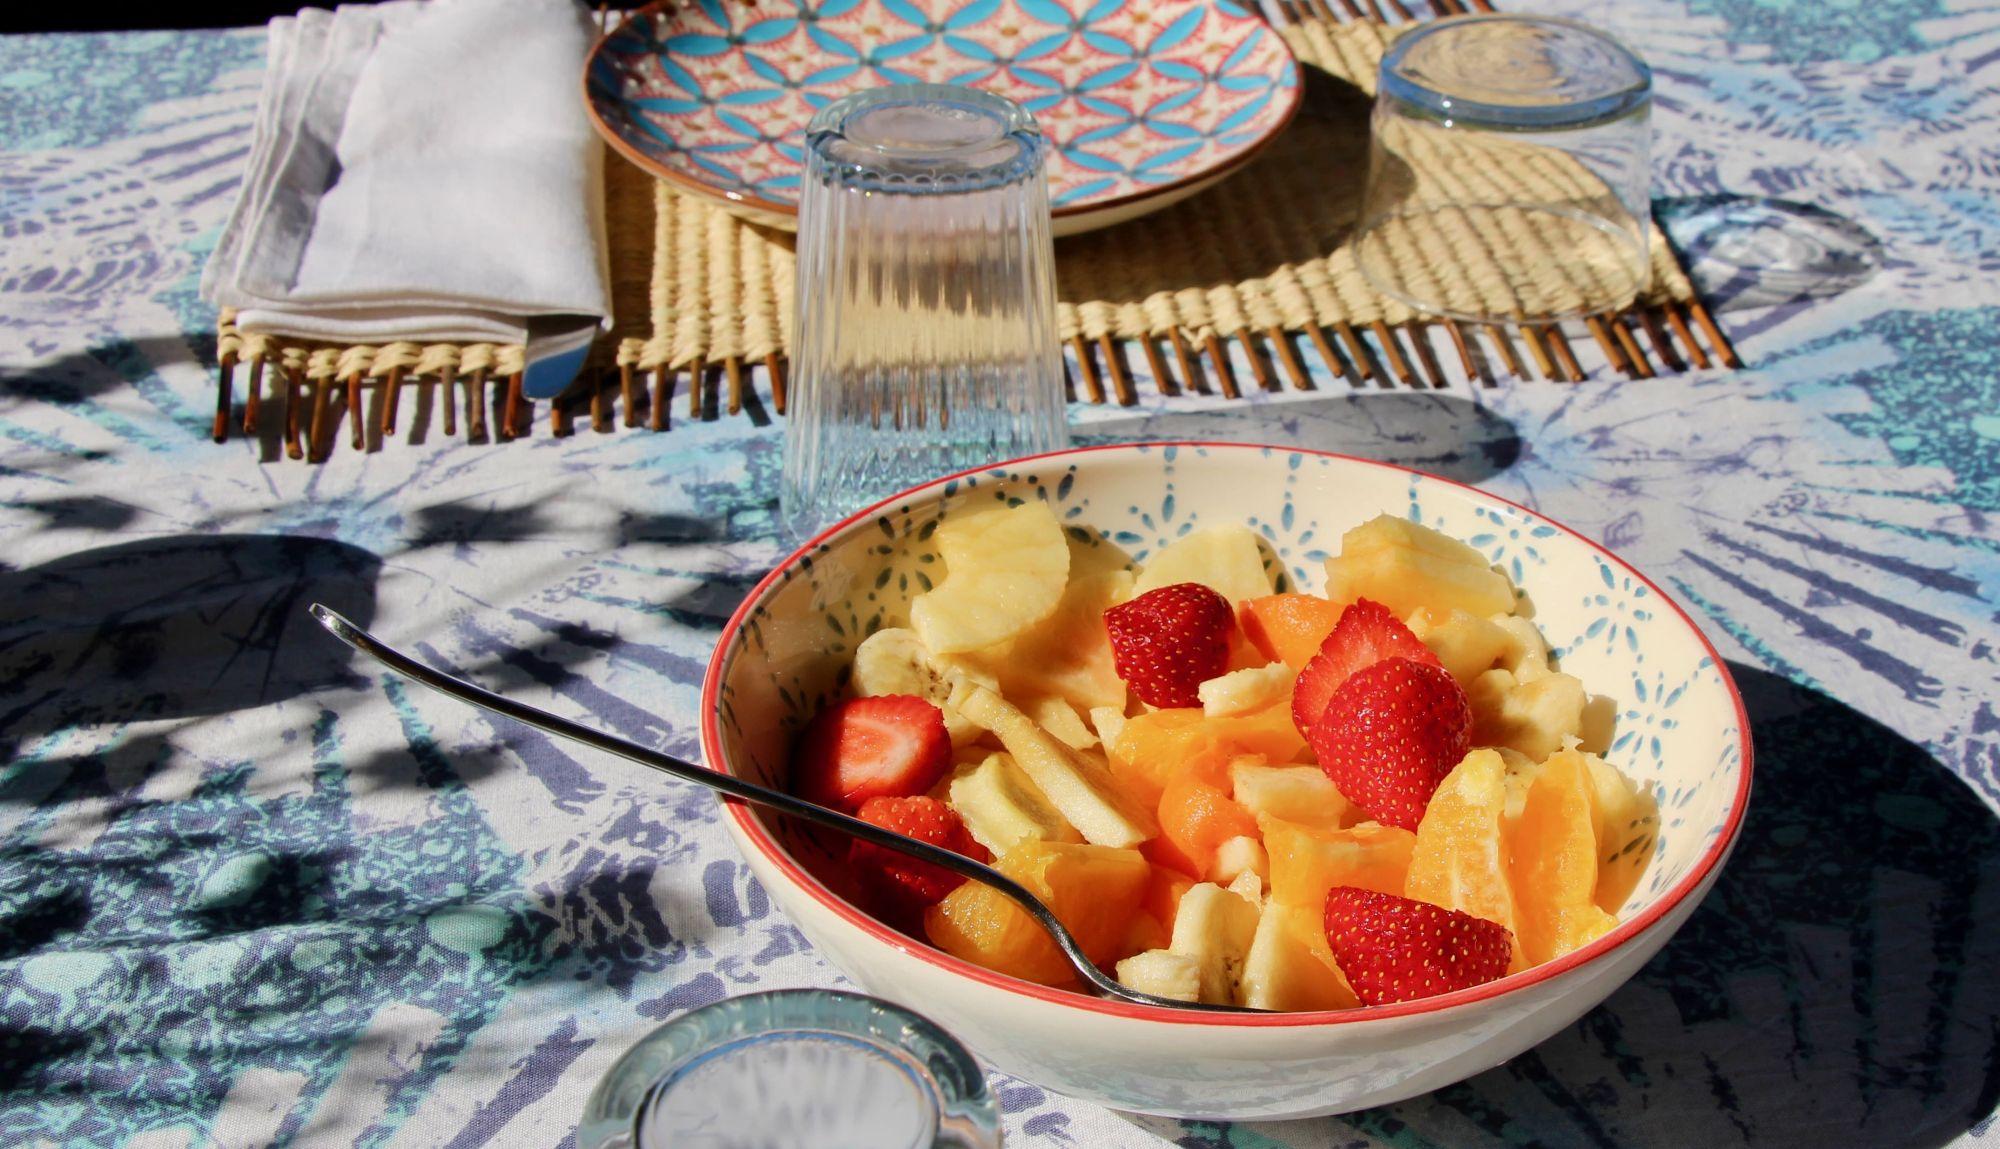 Petit-déjeuner en terrasse